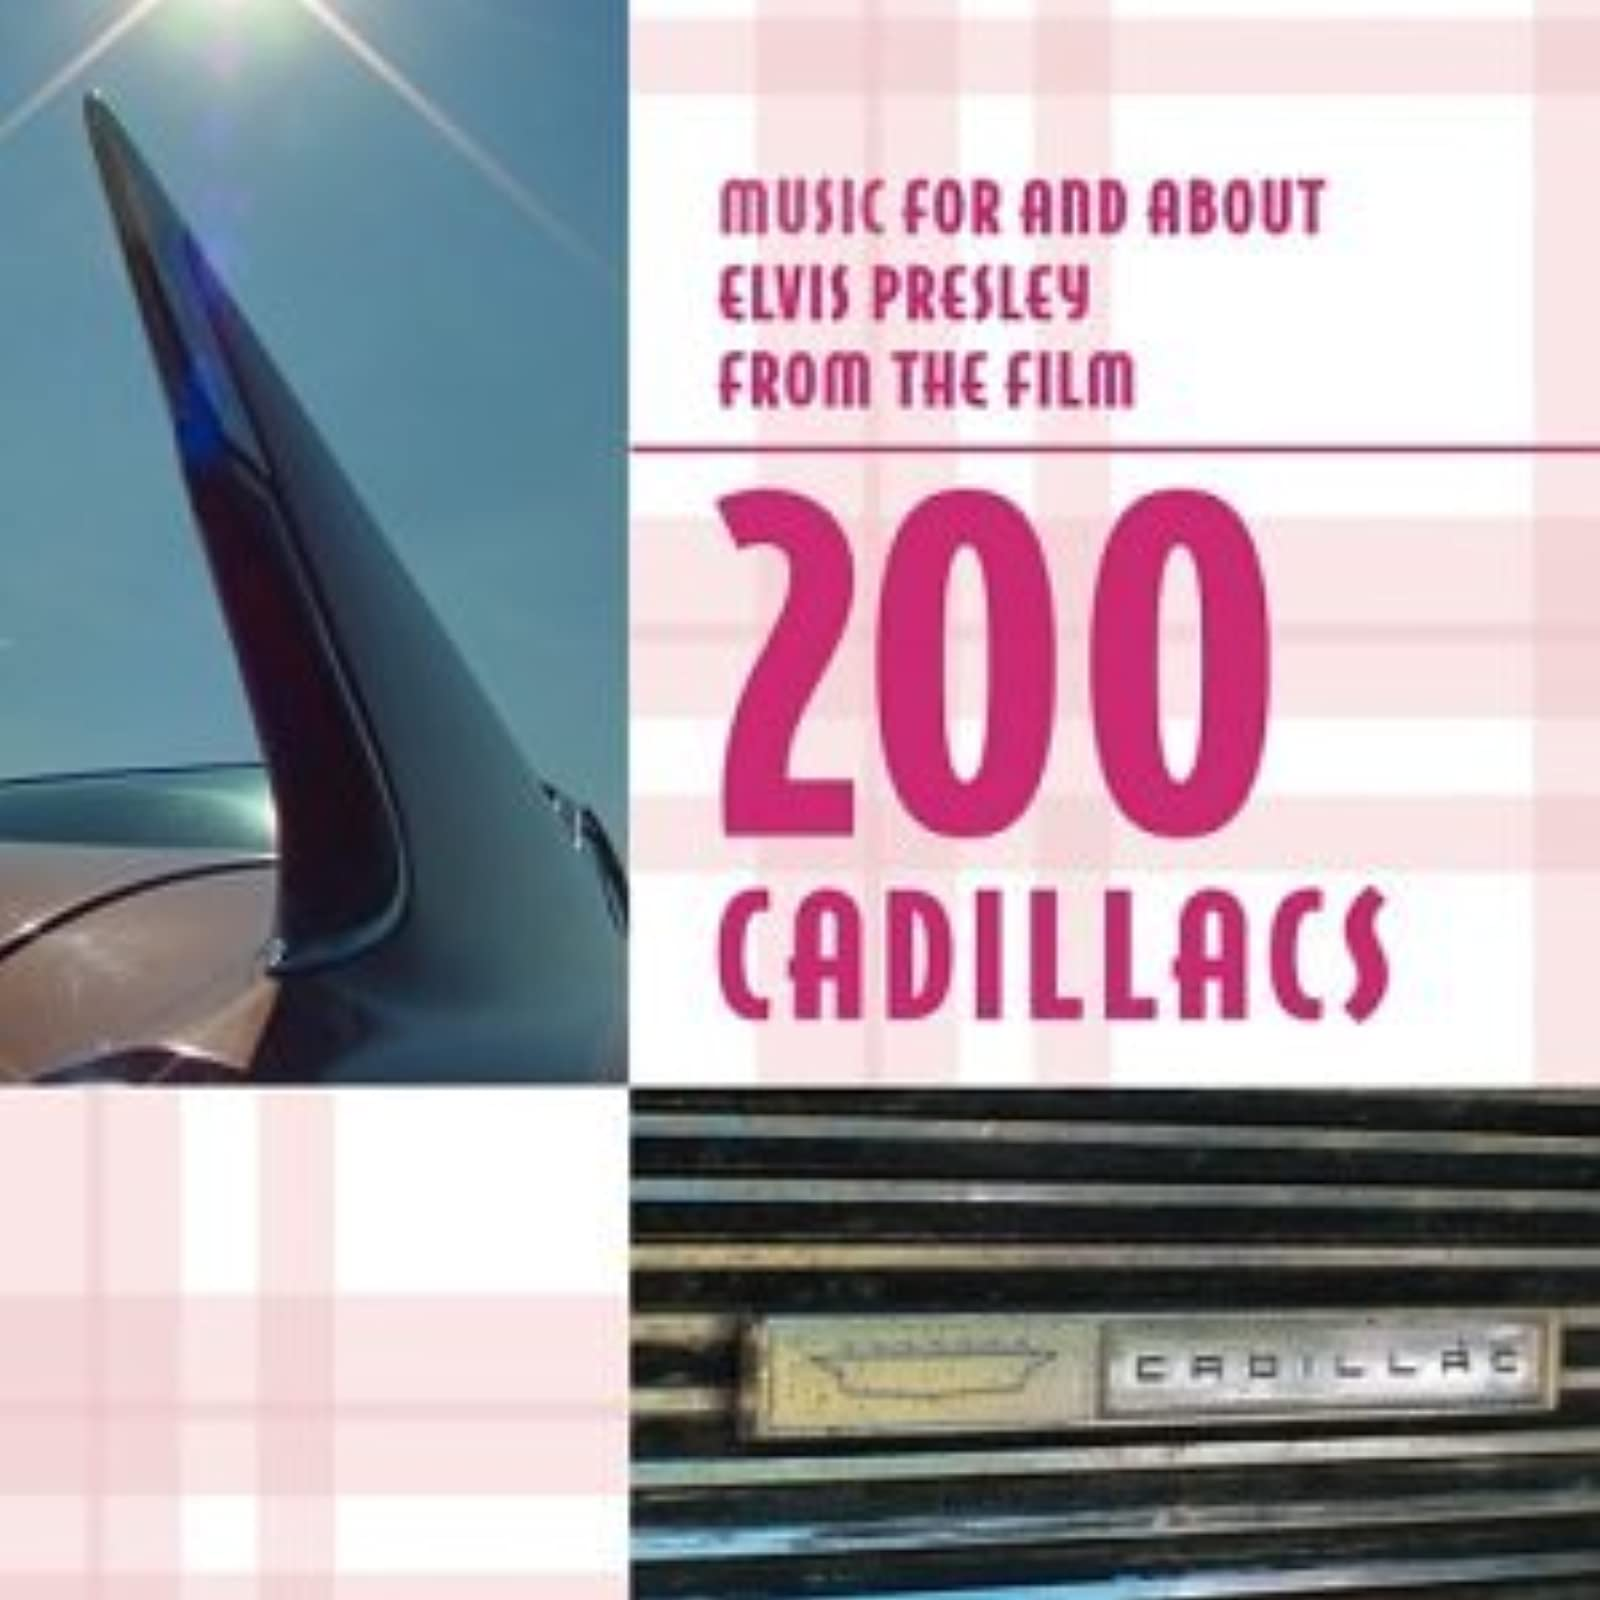 200 Cadillacs By 200 Cadillacs On Audio CD Album 2004